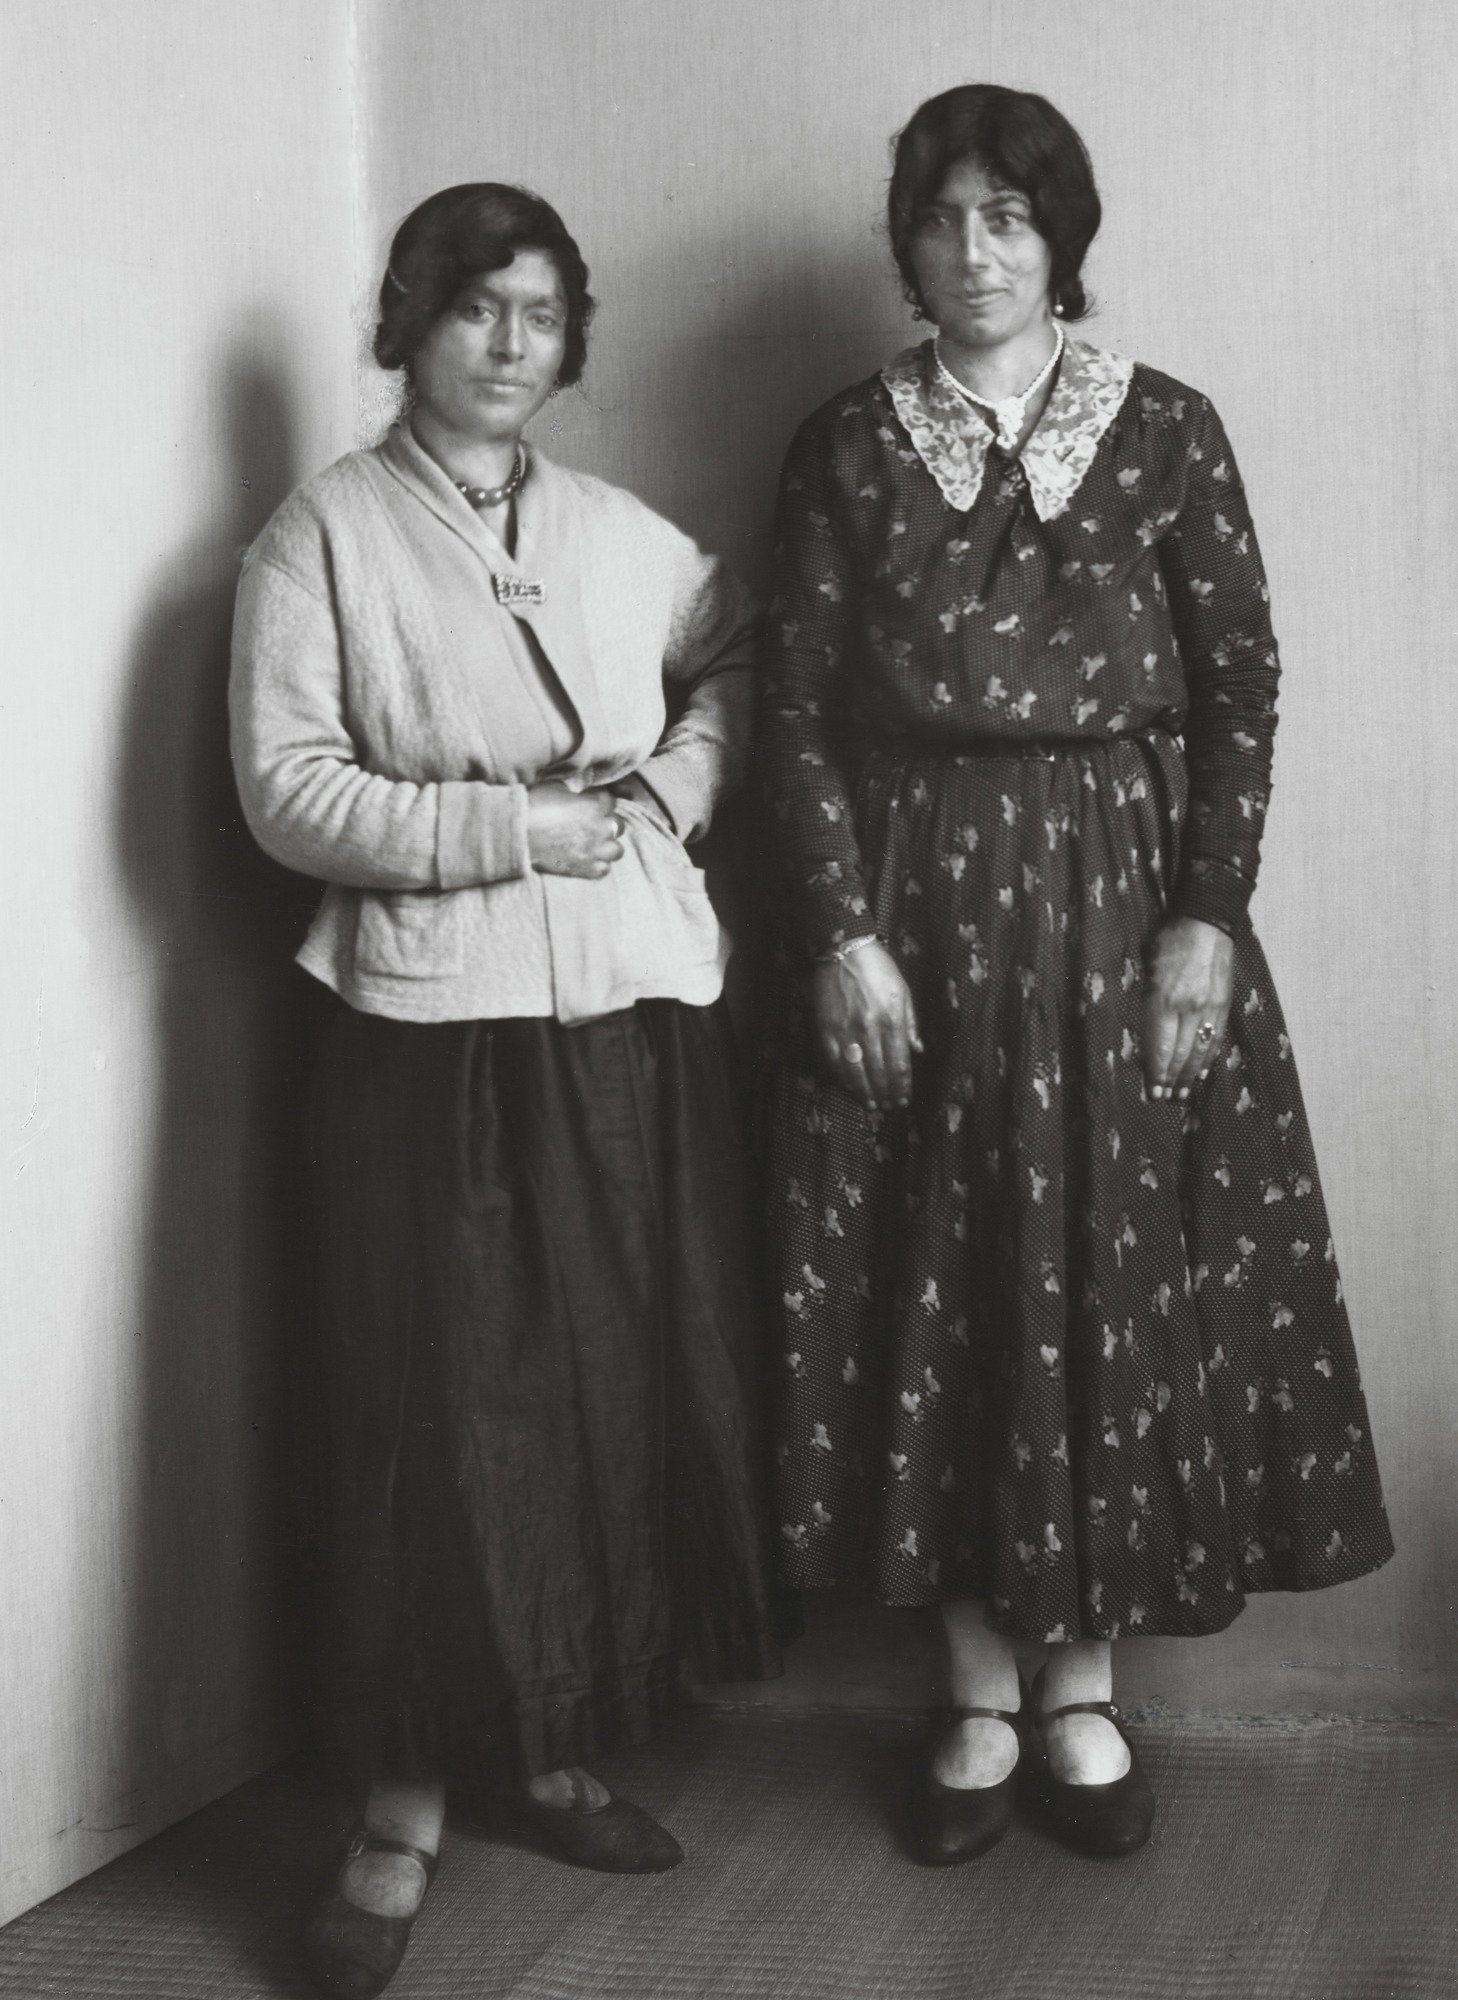 August Sander. Gypsy Women. c. 1930